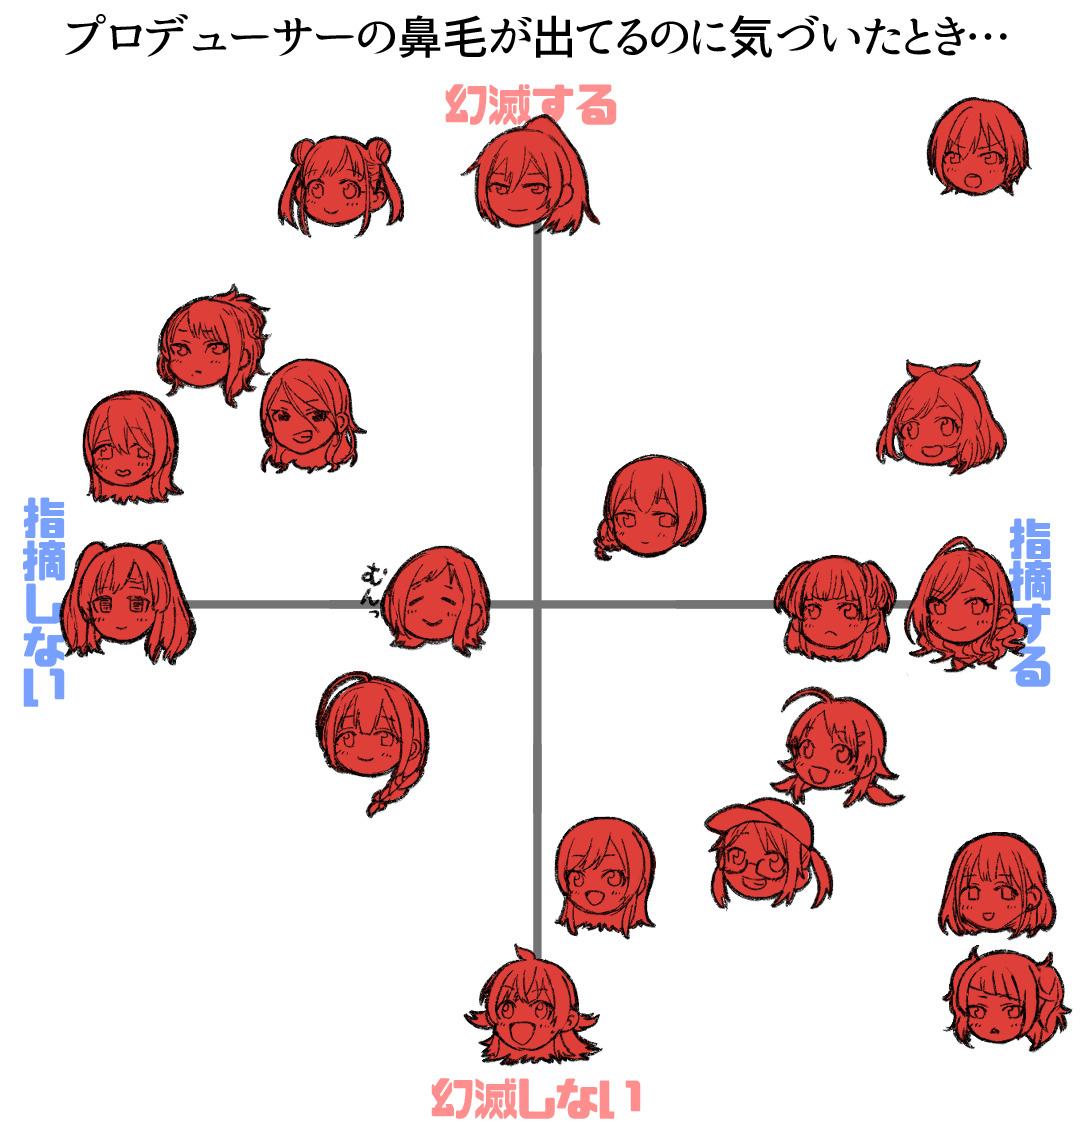 f:id:hoshi_sano:20200414110448j:image:w400